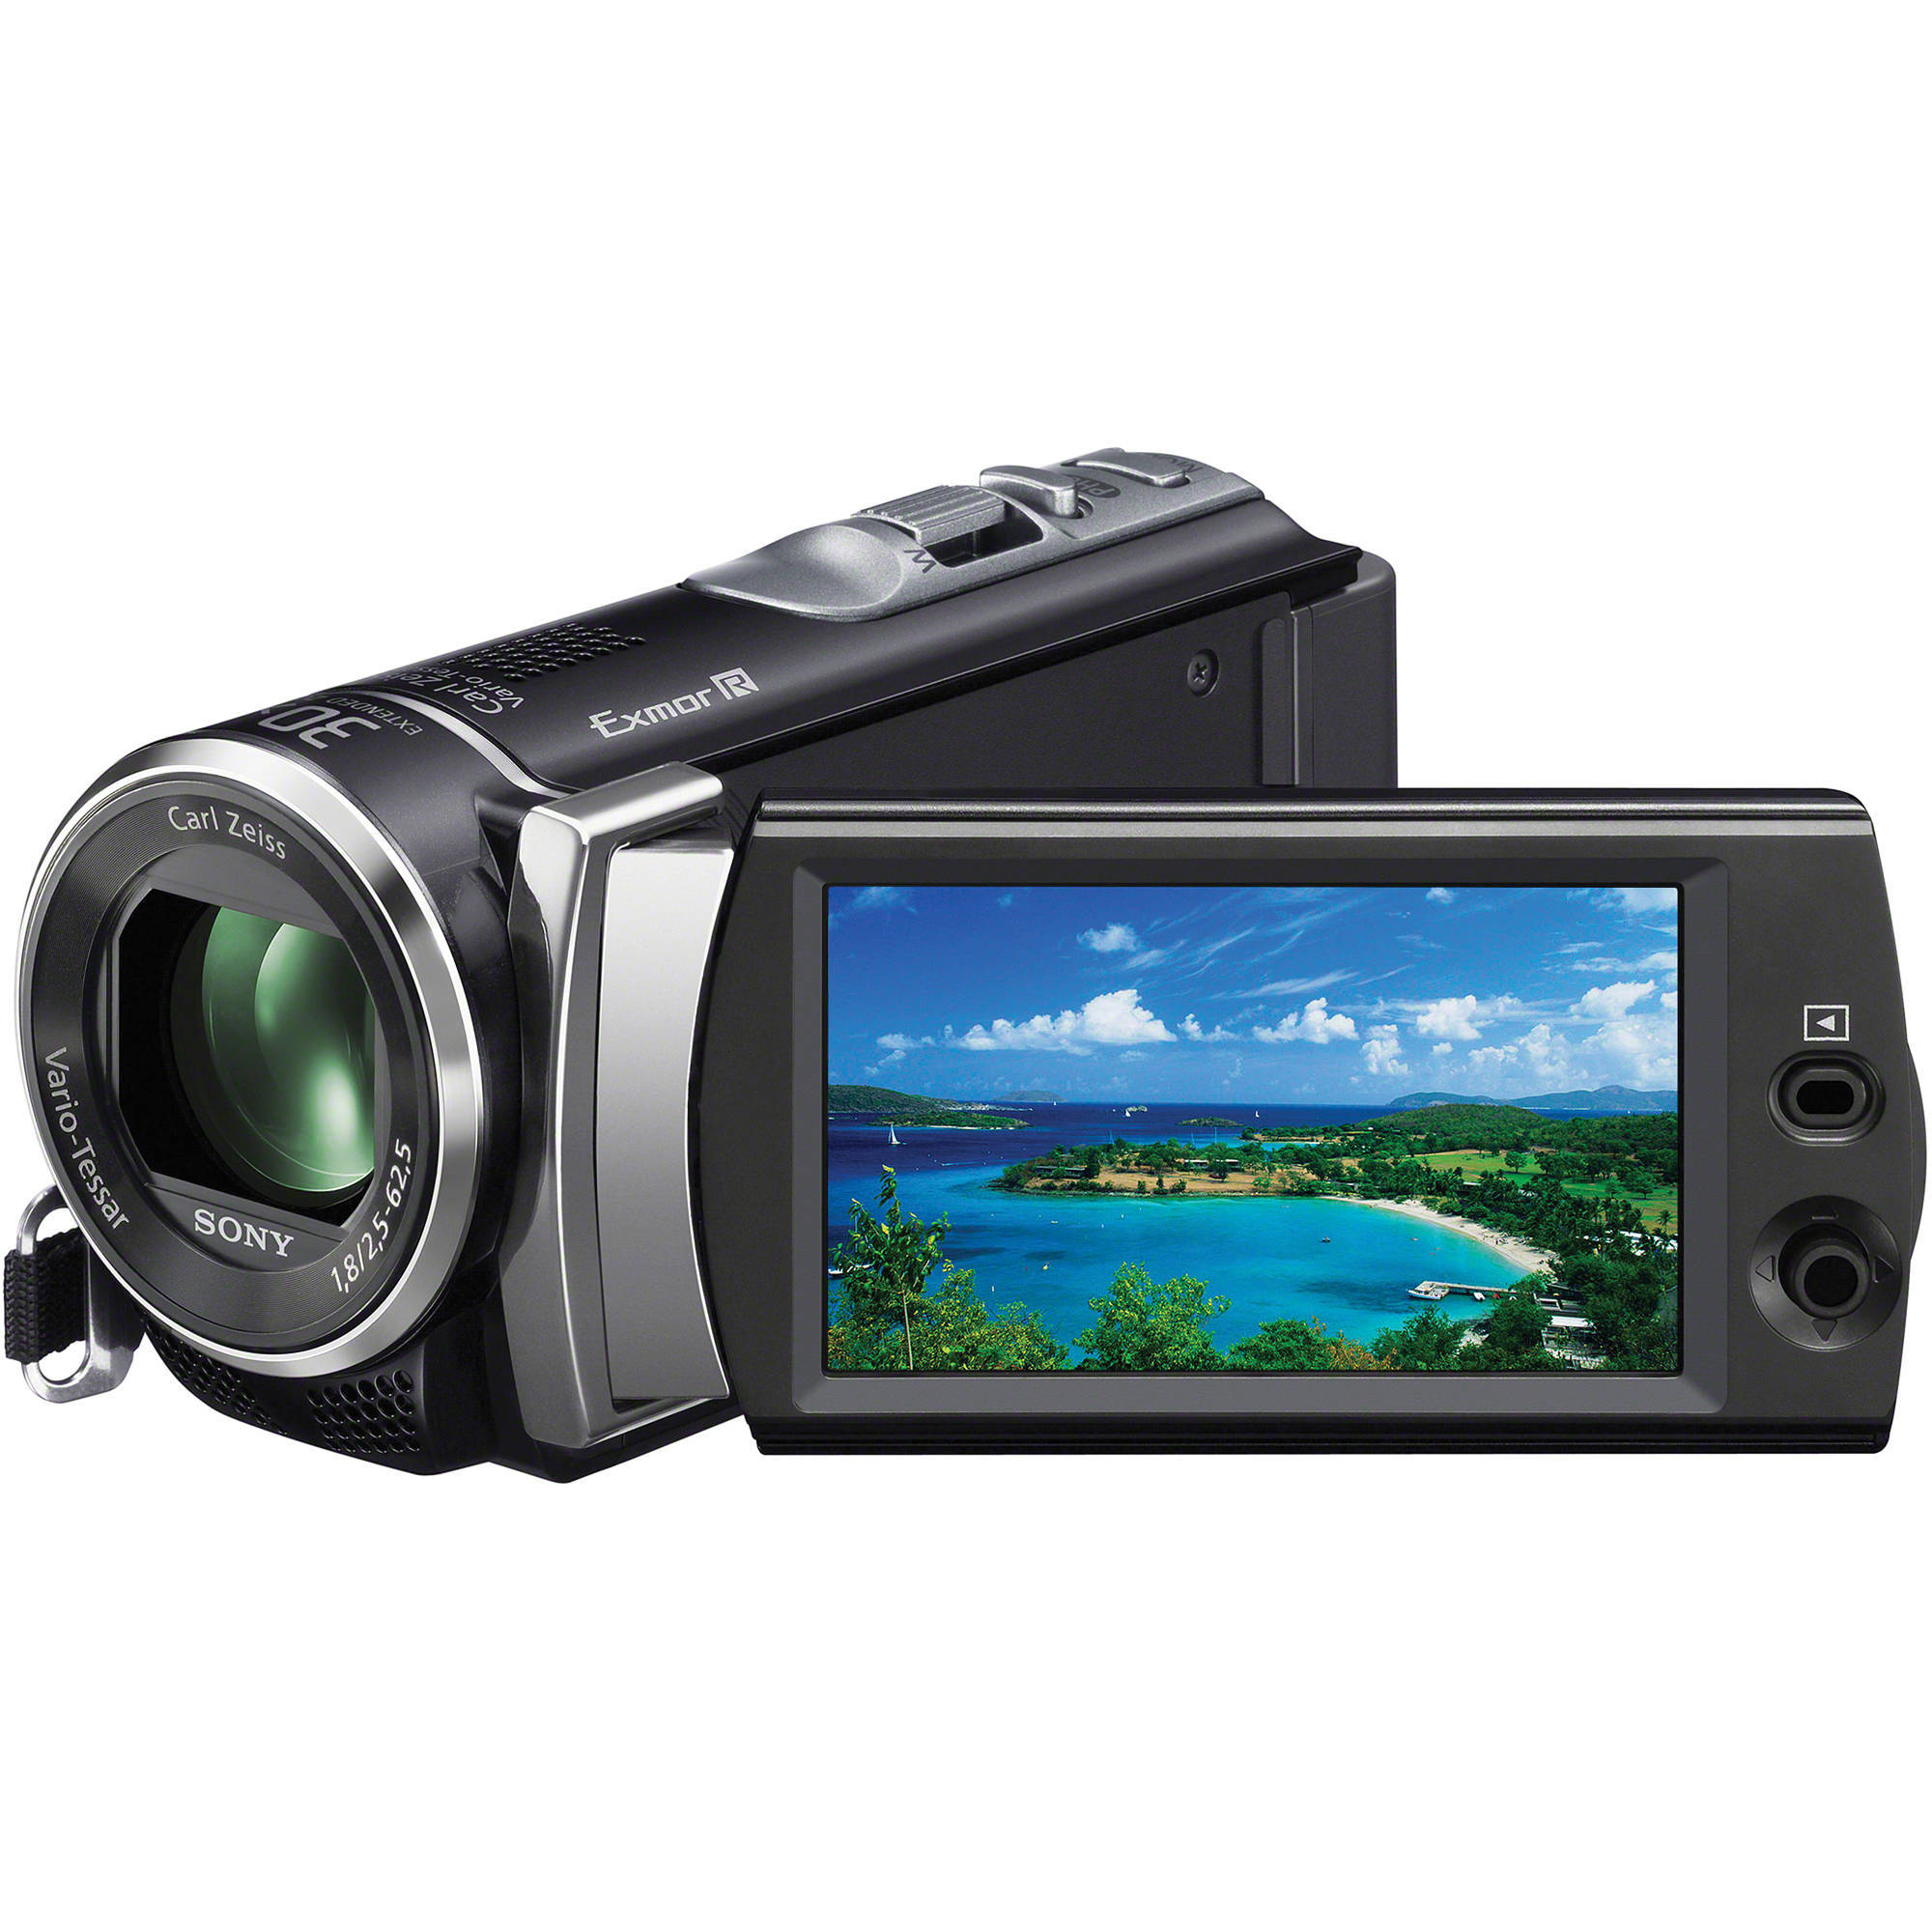 sony hdr cx190 high definition handycam camcorder hdrcx190 b b h rh bhphotovideo com Amazon Sony HDR CX190 Sony HDR CX190 User Manual